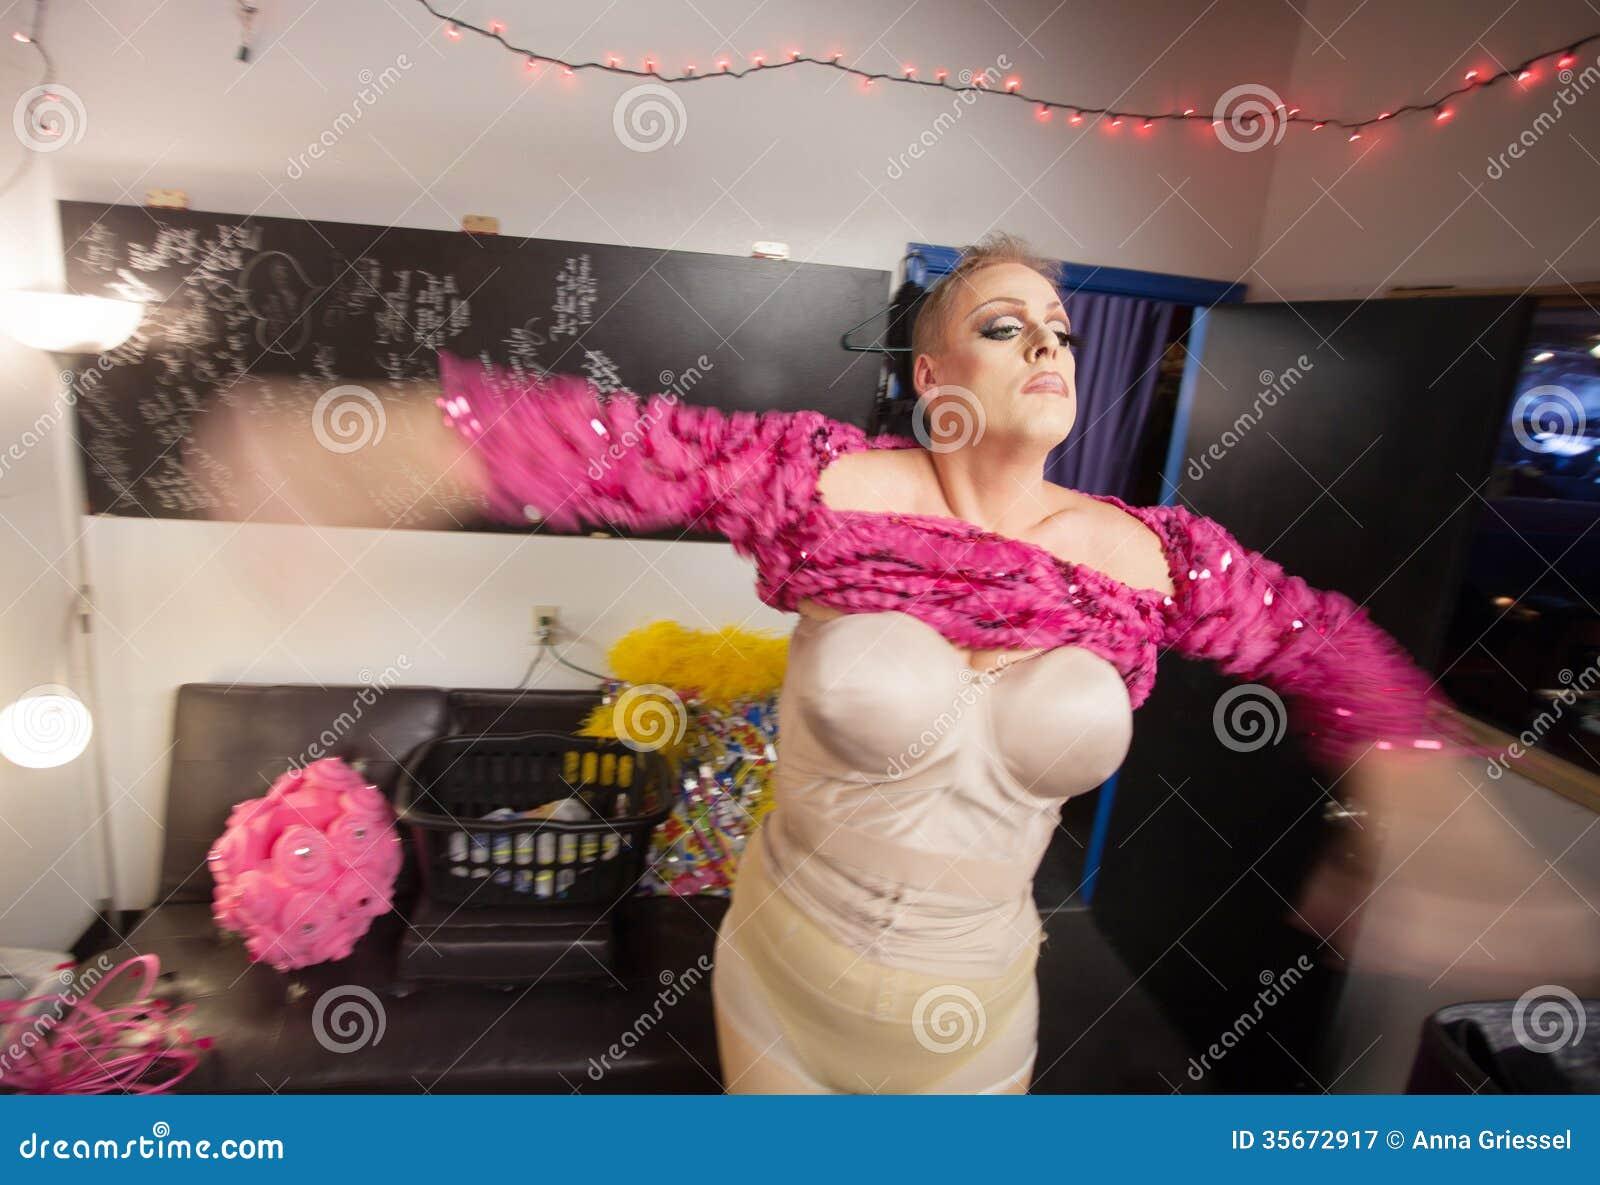 man in corset dressing stock image. image of beautiful - 35672917